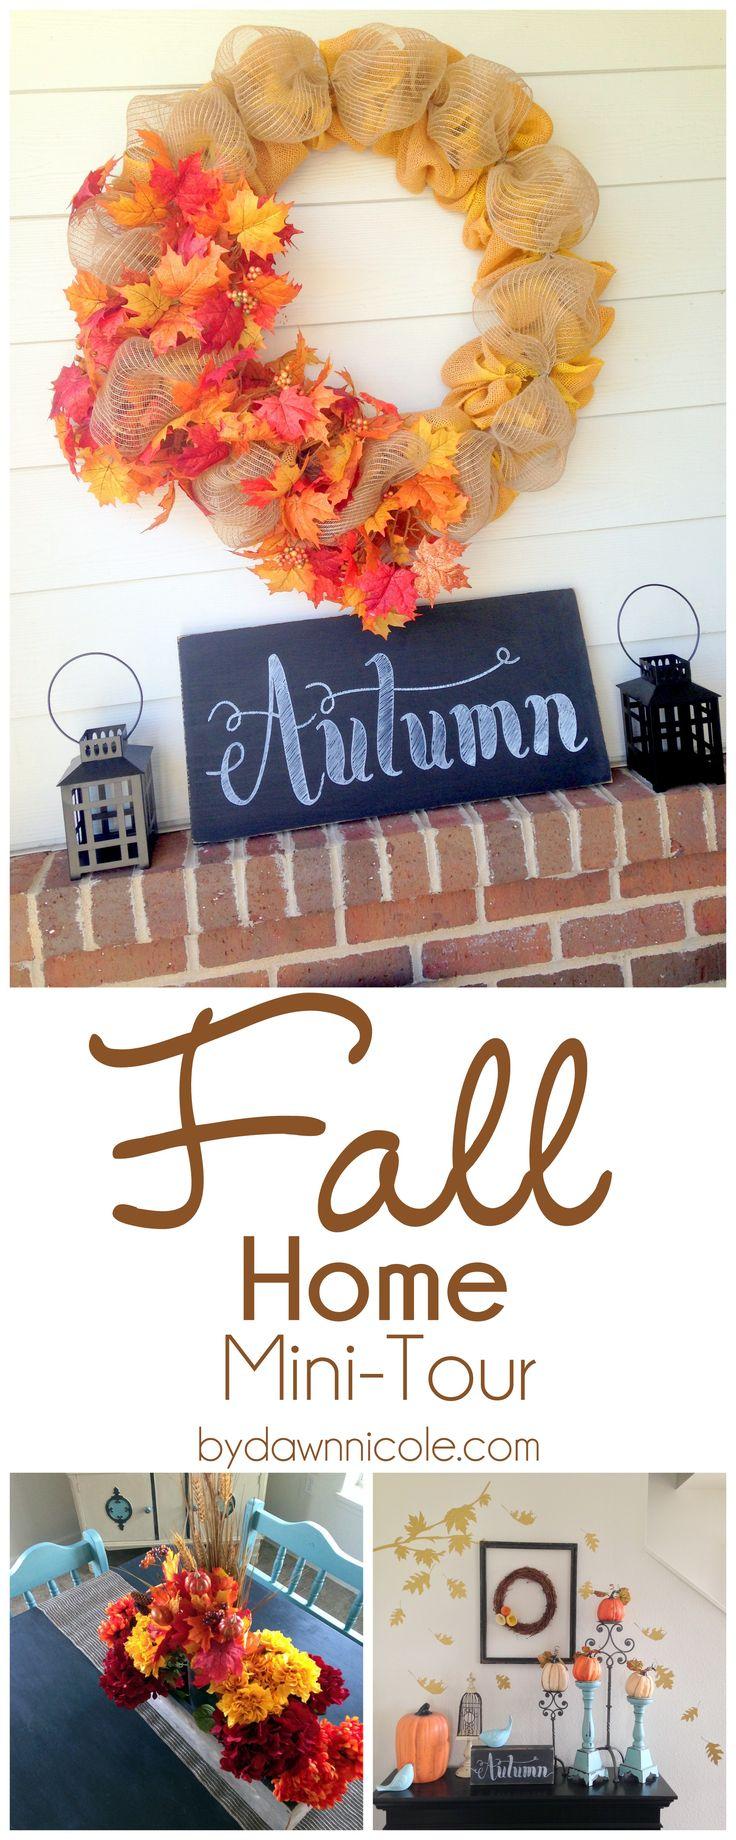 Fall Home Mini-Tour | bydawnnicole.com